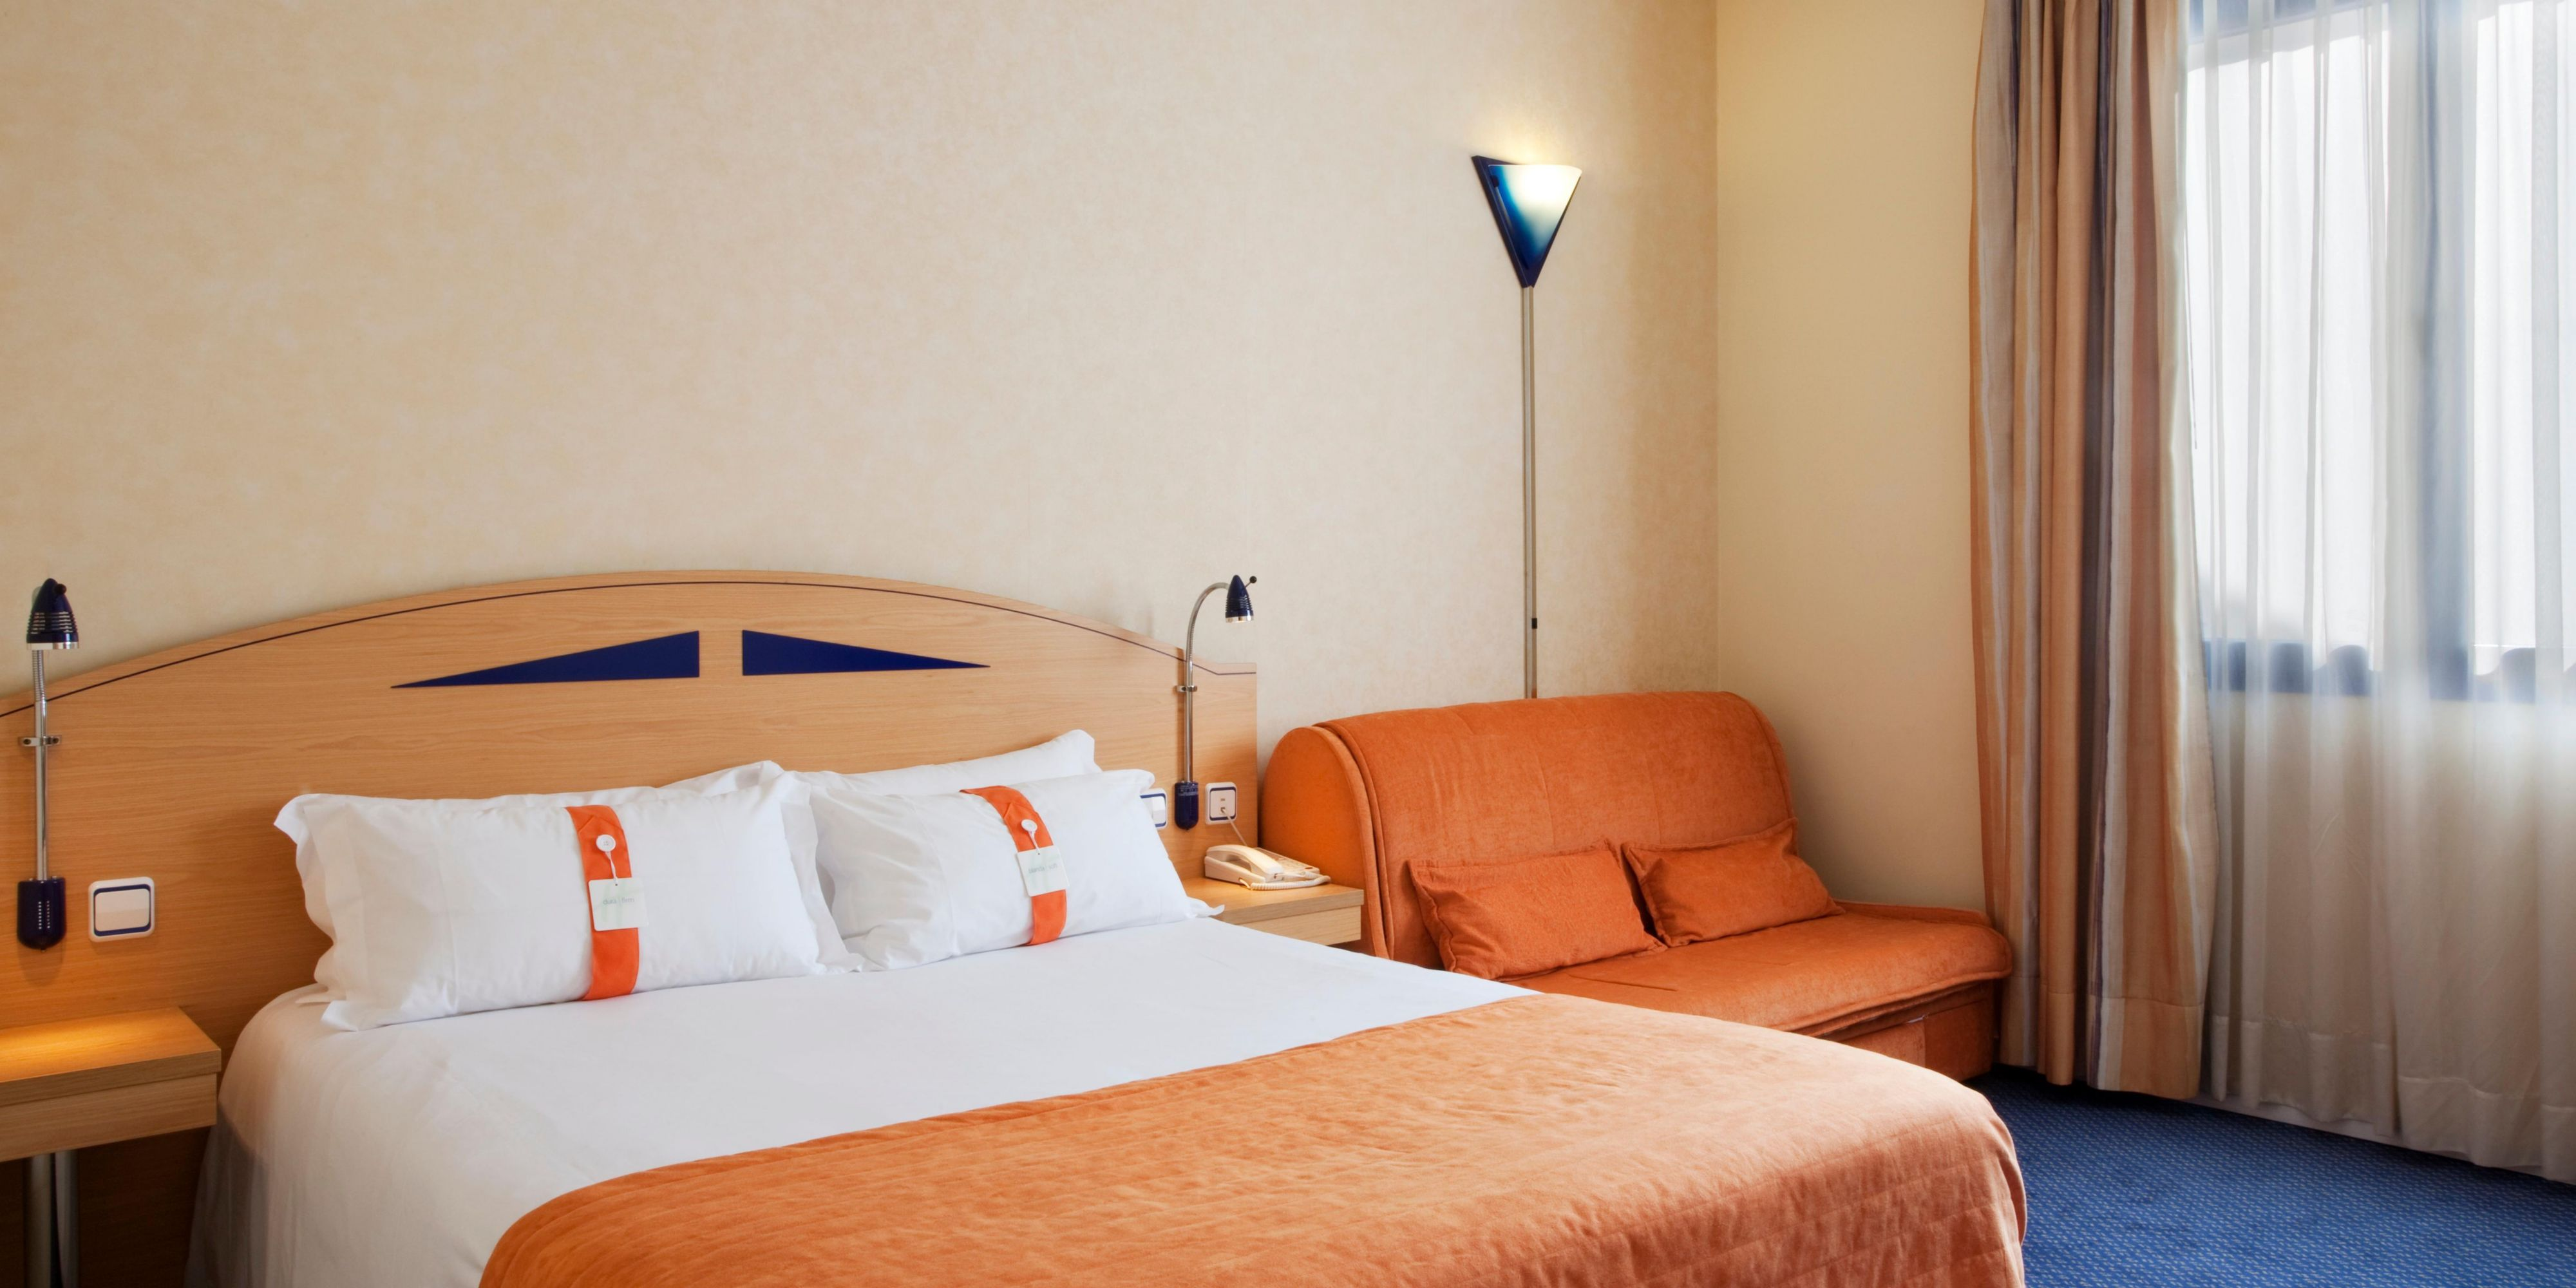 Holiday Inn Express Madrid San Sebastian d l Reyes Hotel by IHG